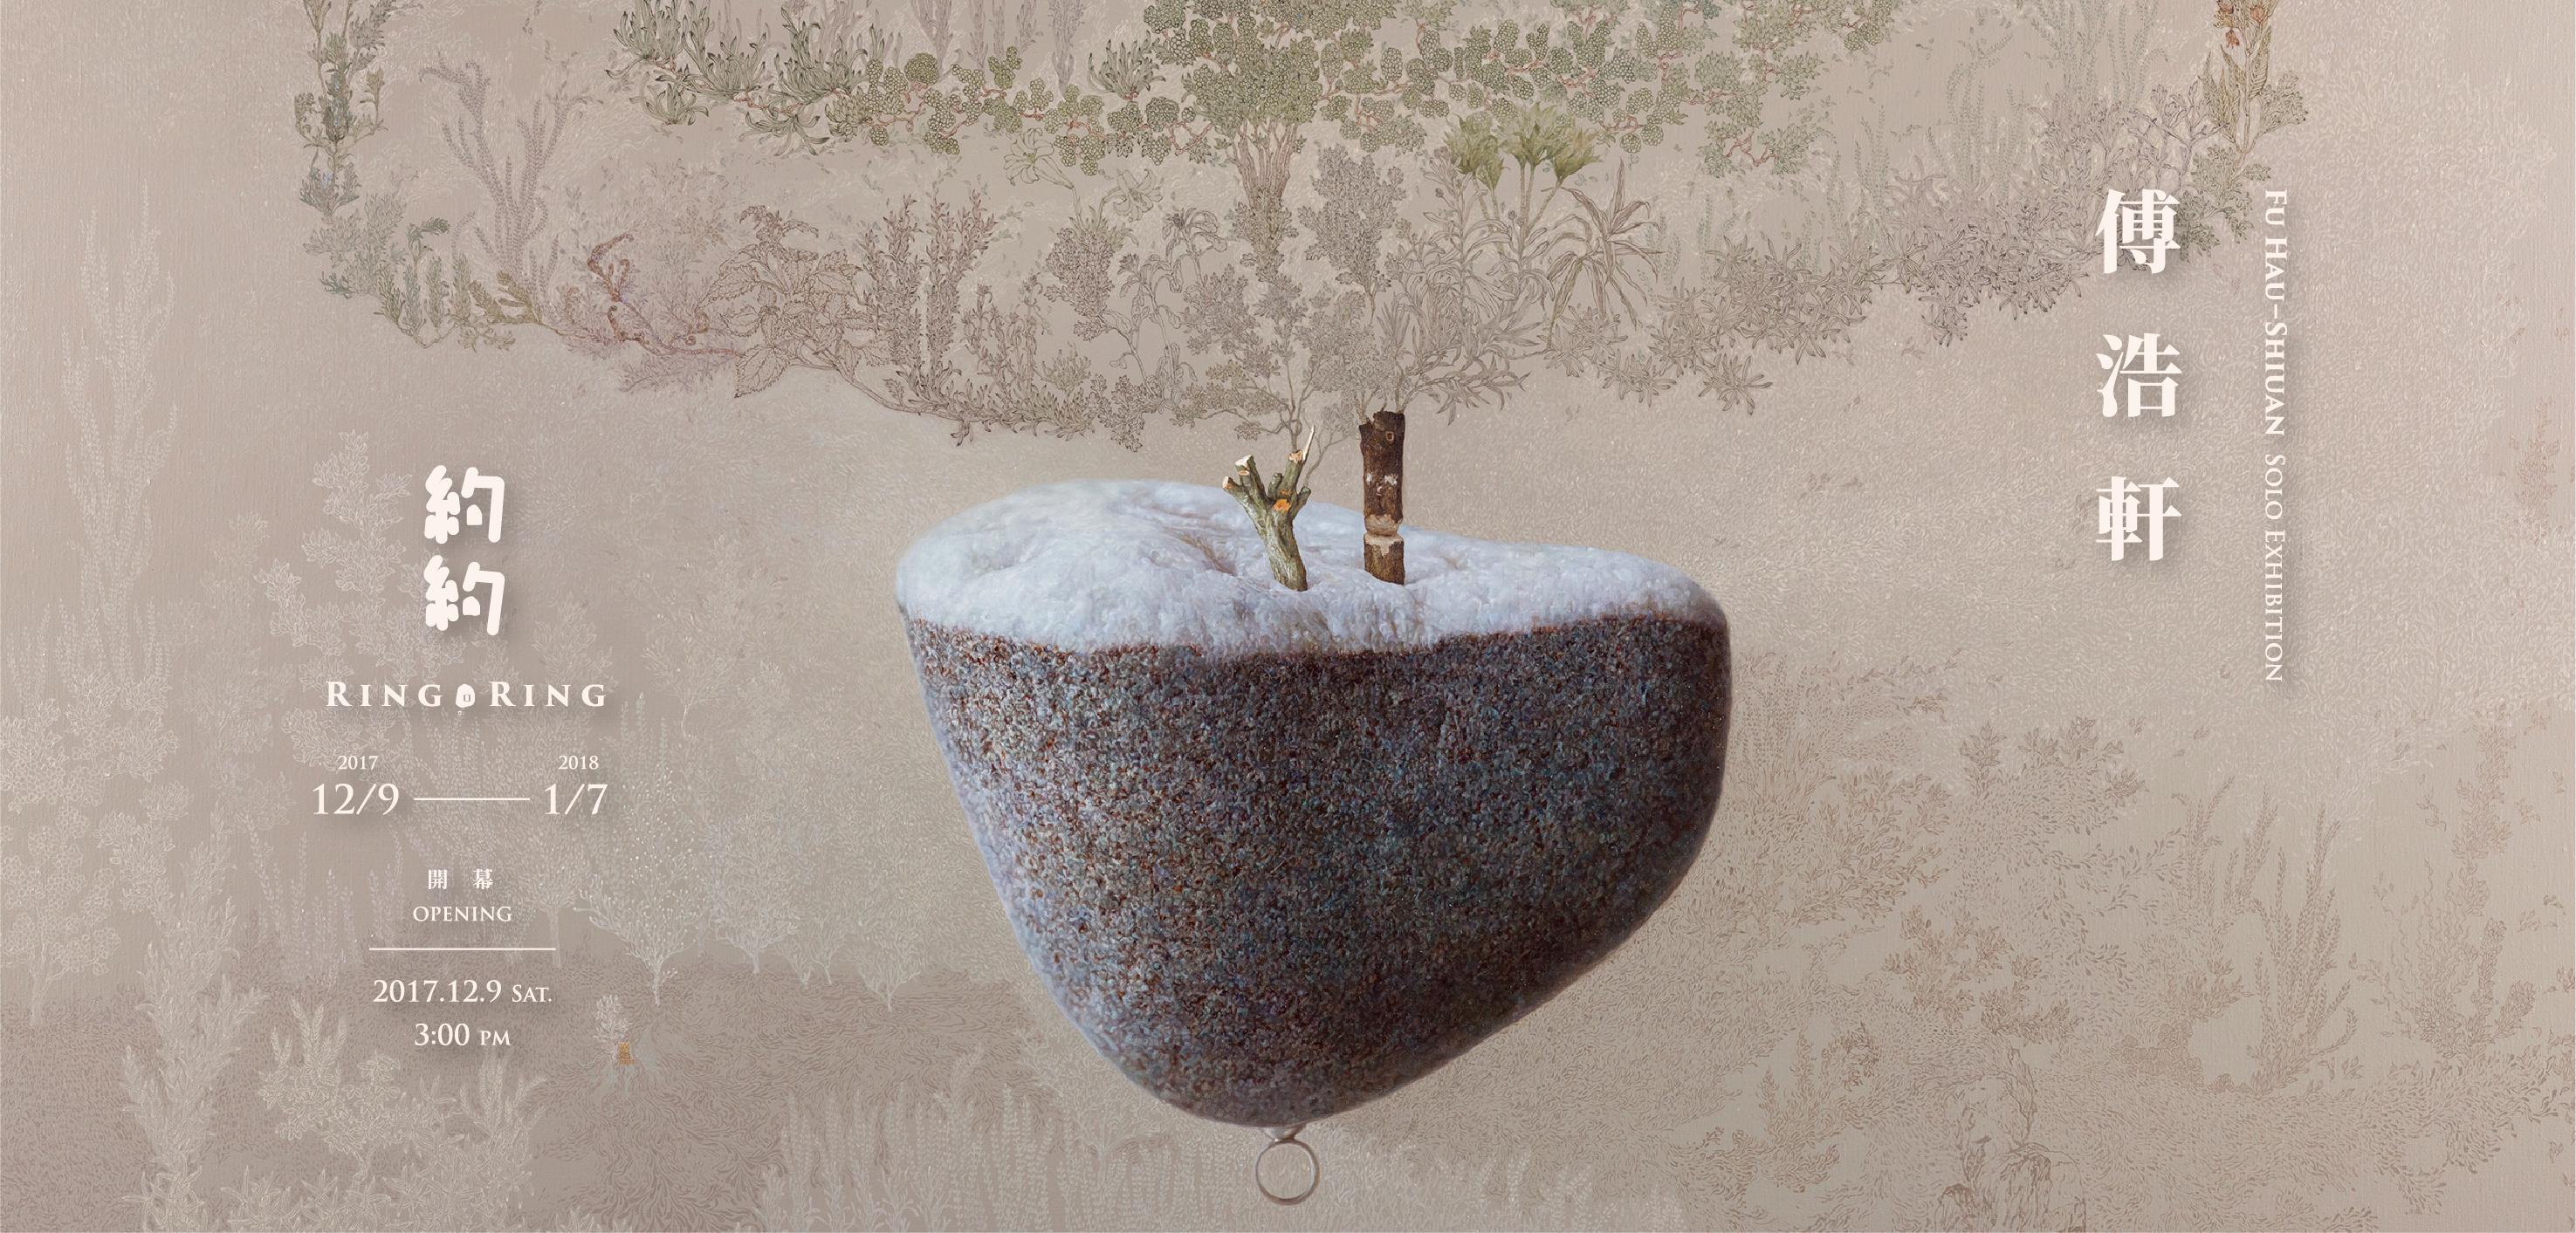 Ring Ring – Fu Hau-Shiuan Solo Exhibition